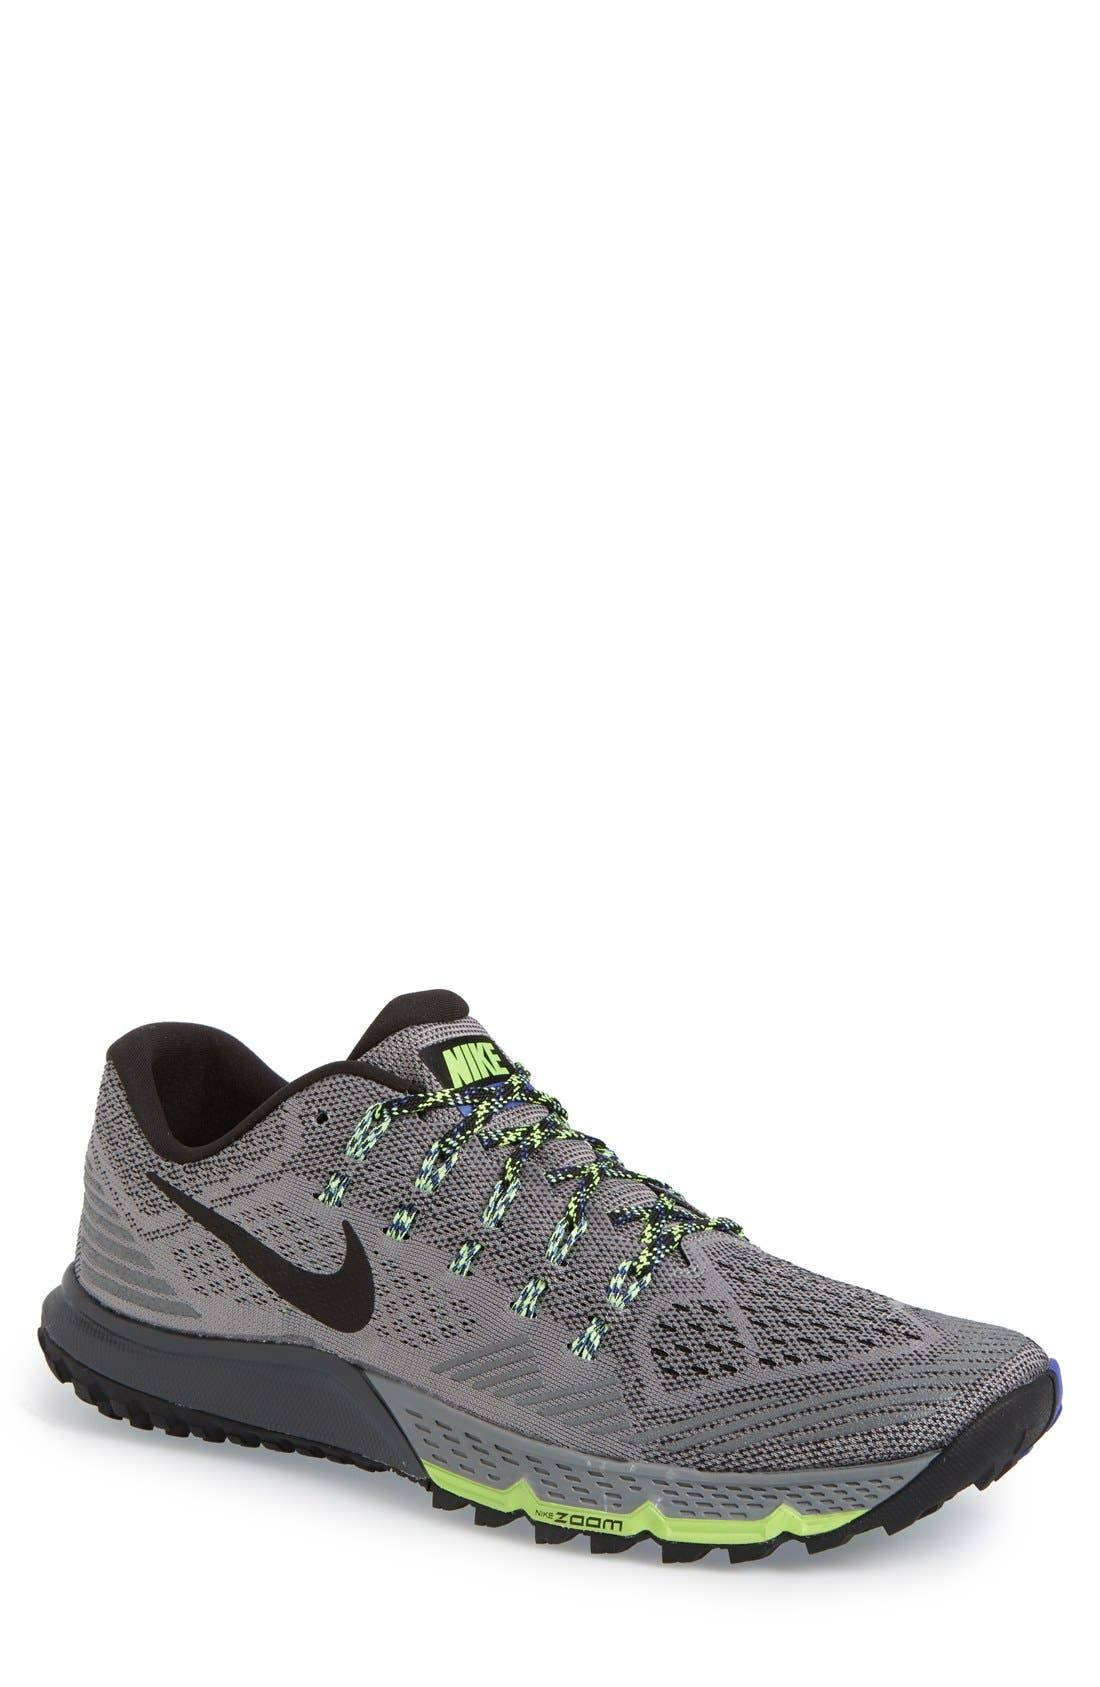 'Zoom Terra Kiger 3' Trail Running Shoe,                             Main thumbnail 1, color,                             081